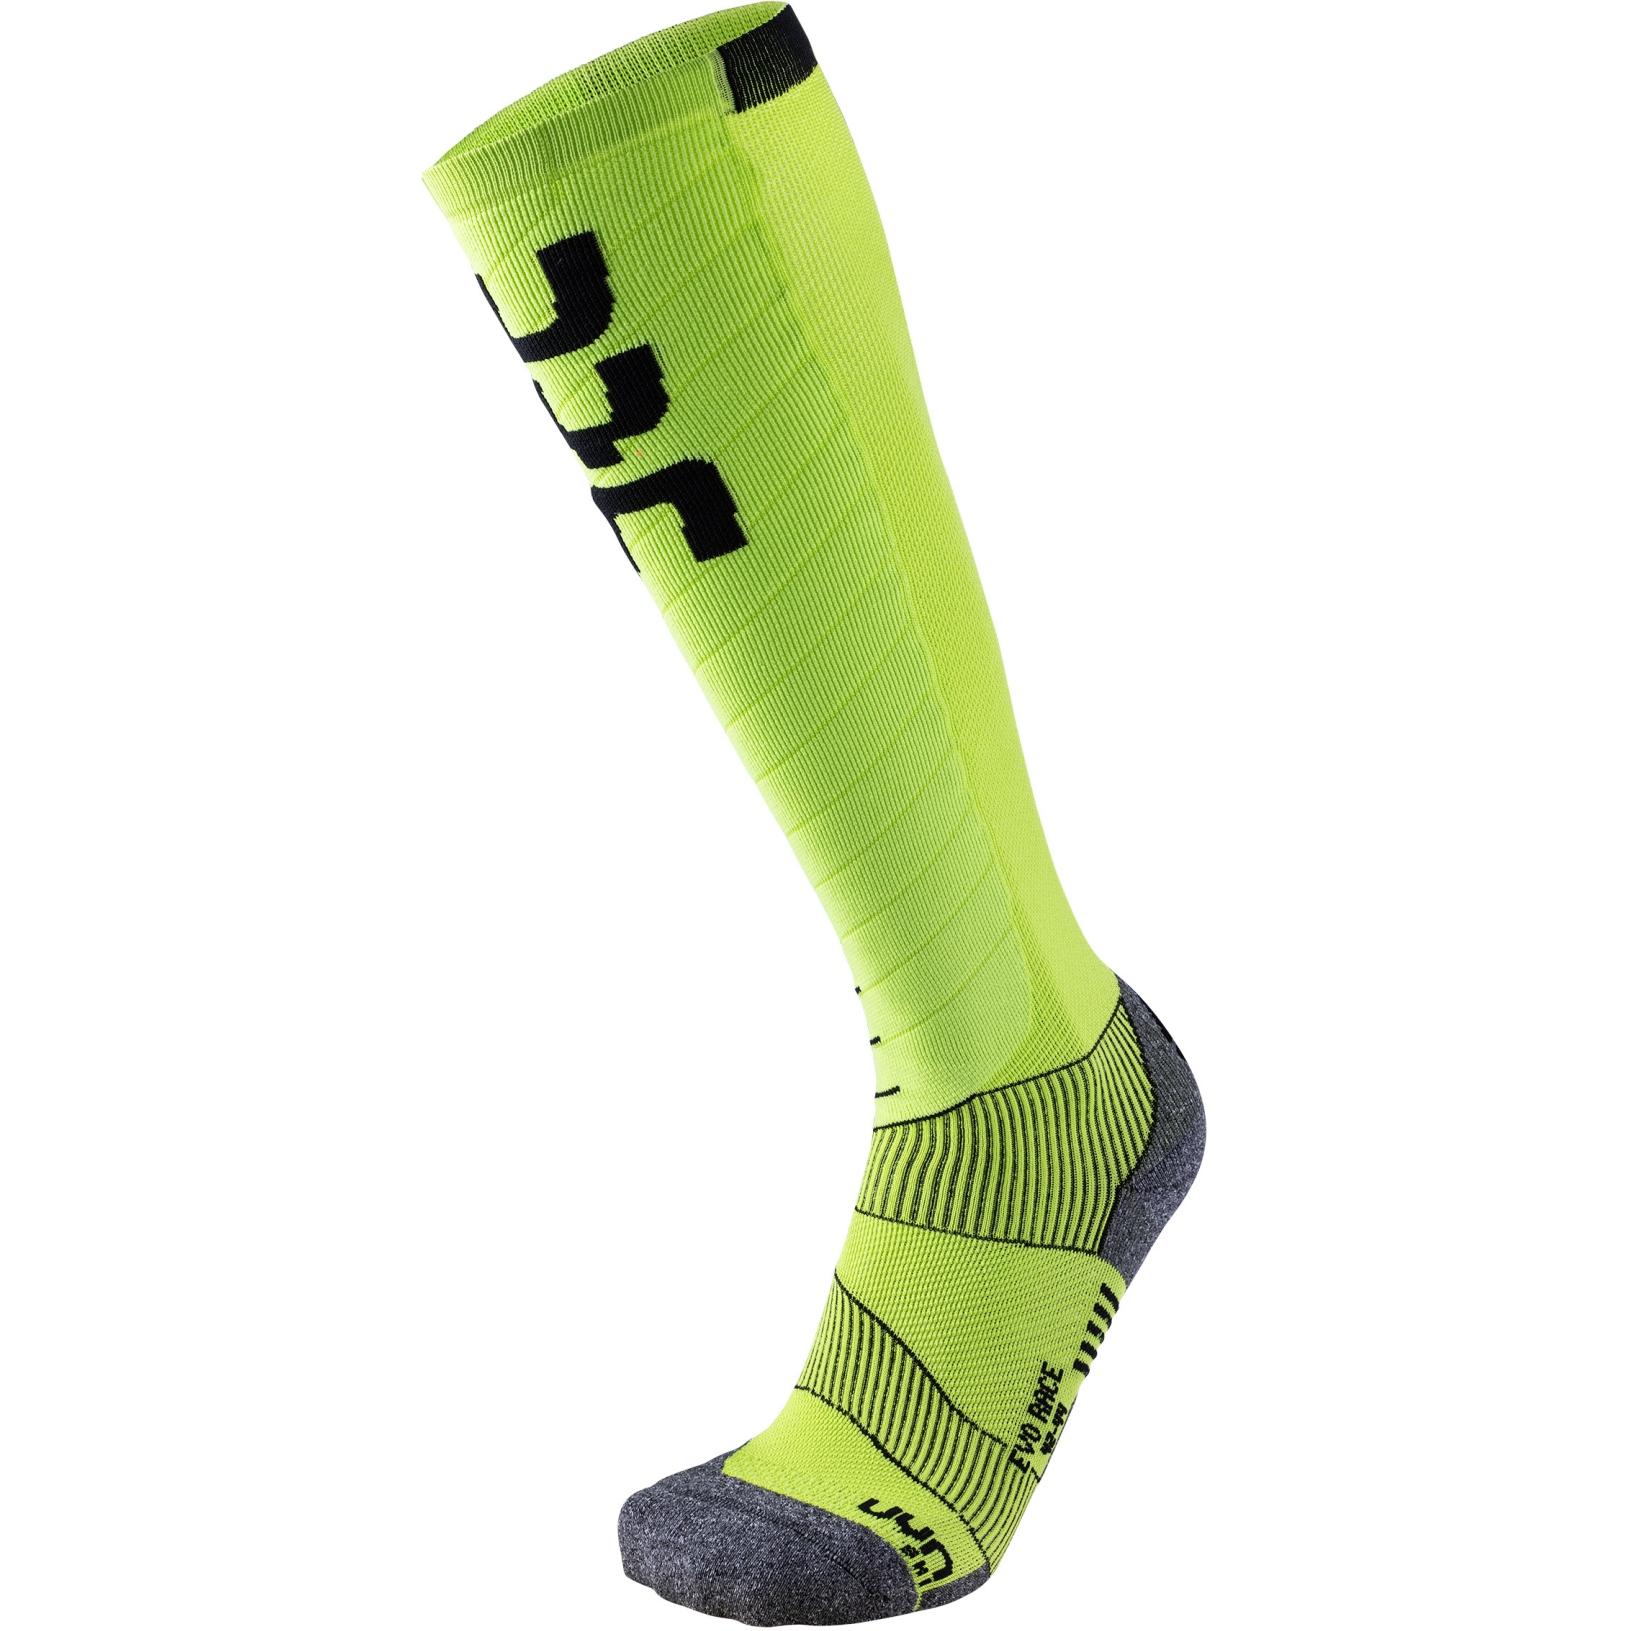 Image of UYN Evo Race Men's Ski Socks - Green Lime/Black